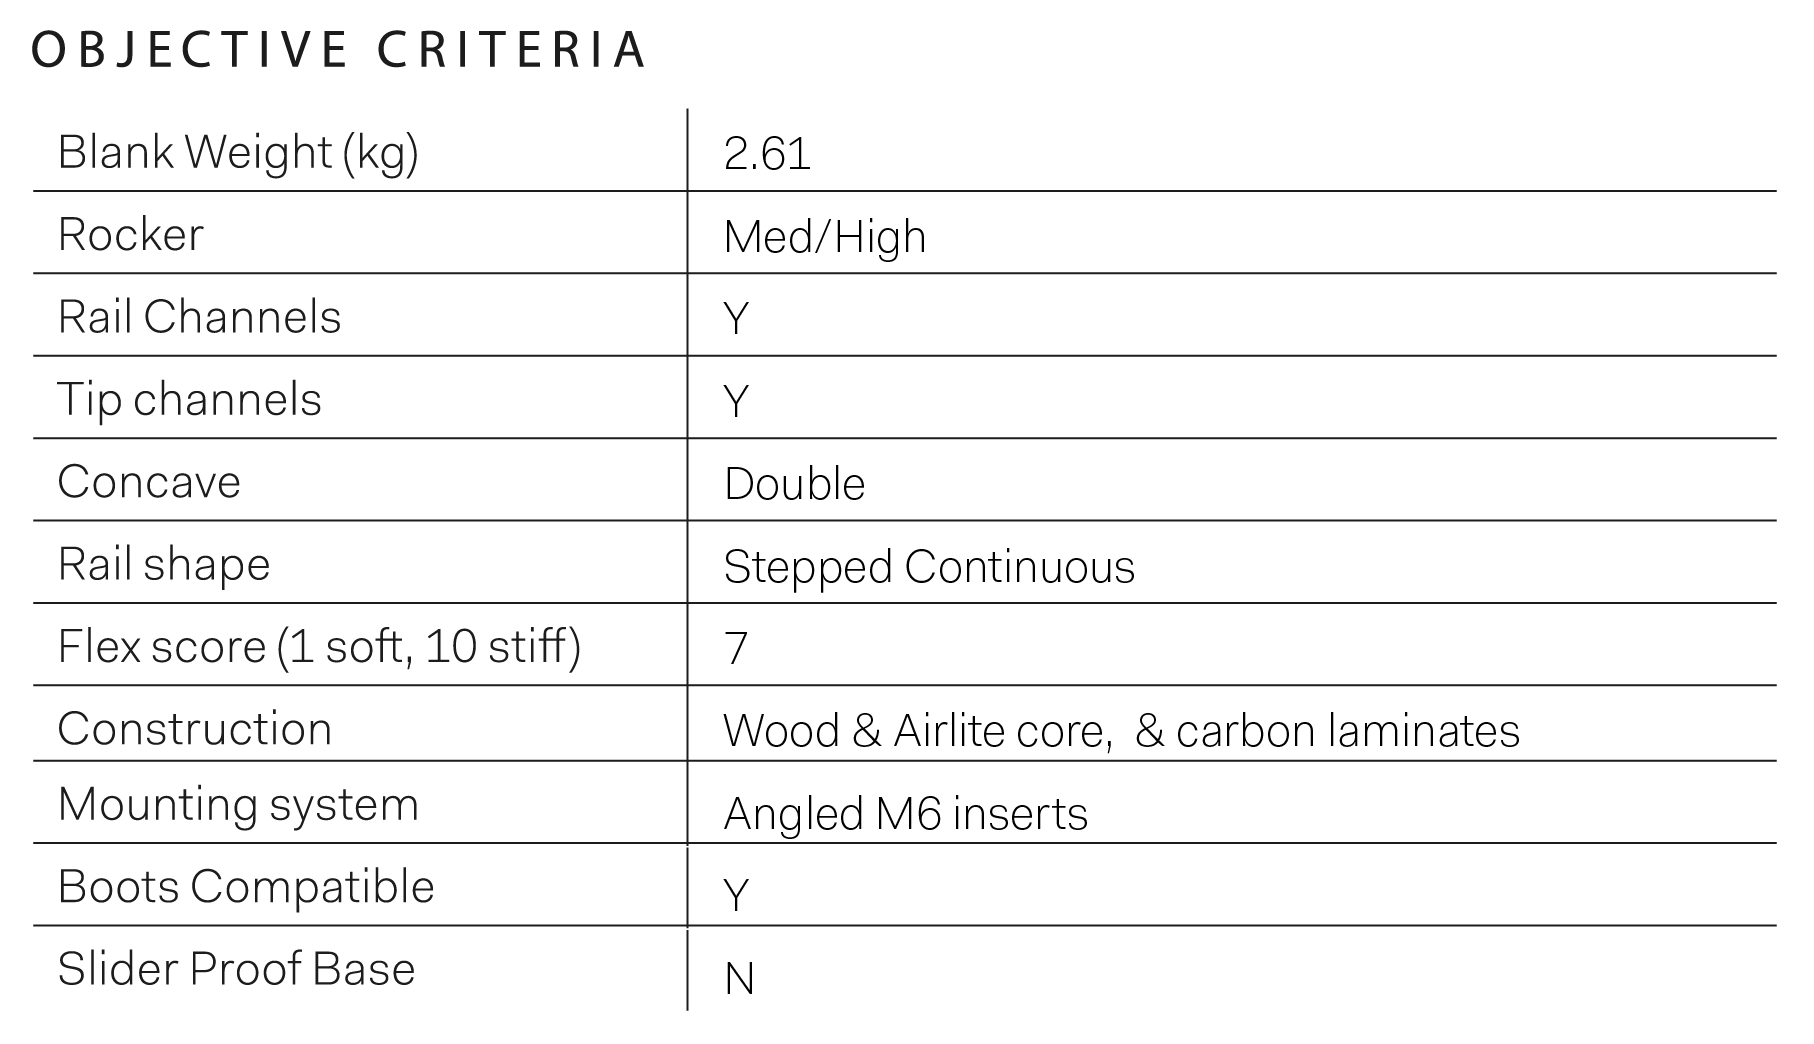 NOBILE NHP CARBON 139 3 - NOBILE NHP CARBON 139